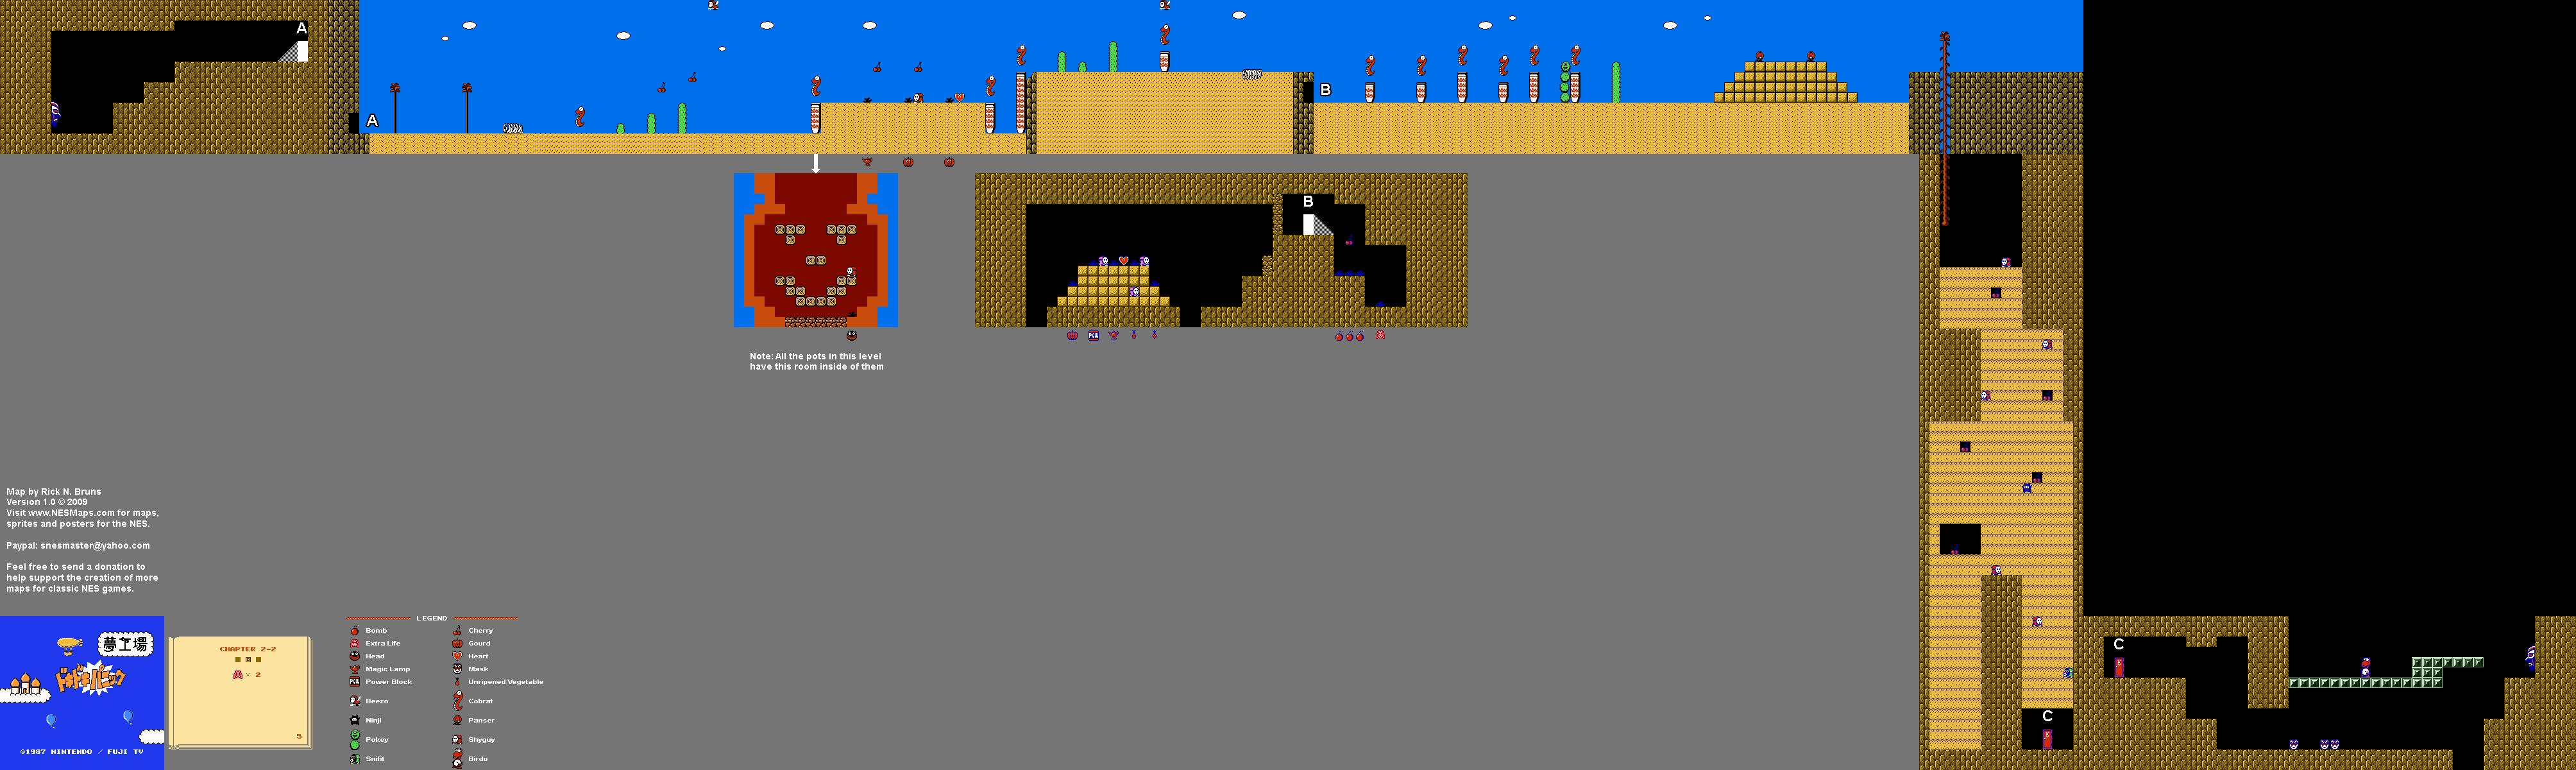 Doki Doki Panic - Chapter 2-2 Nintendo NES Famicom FDS Map